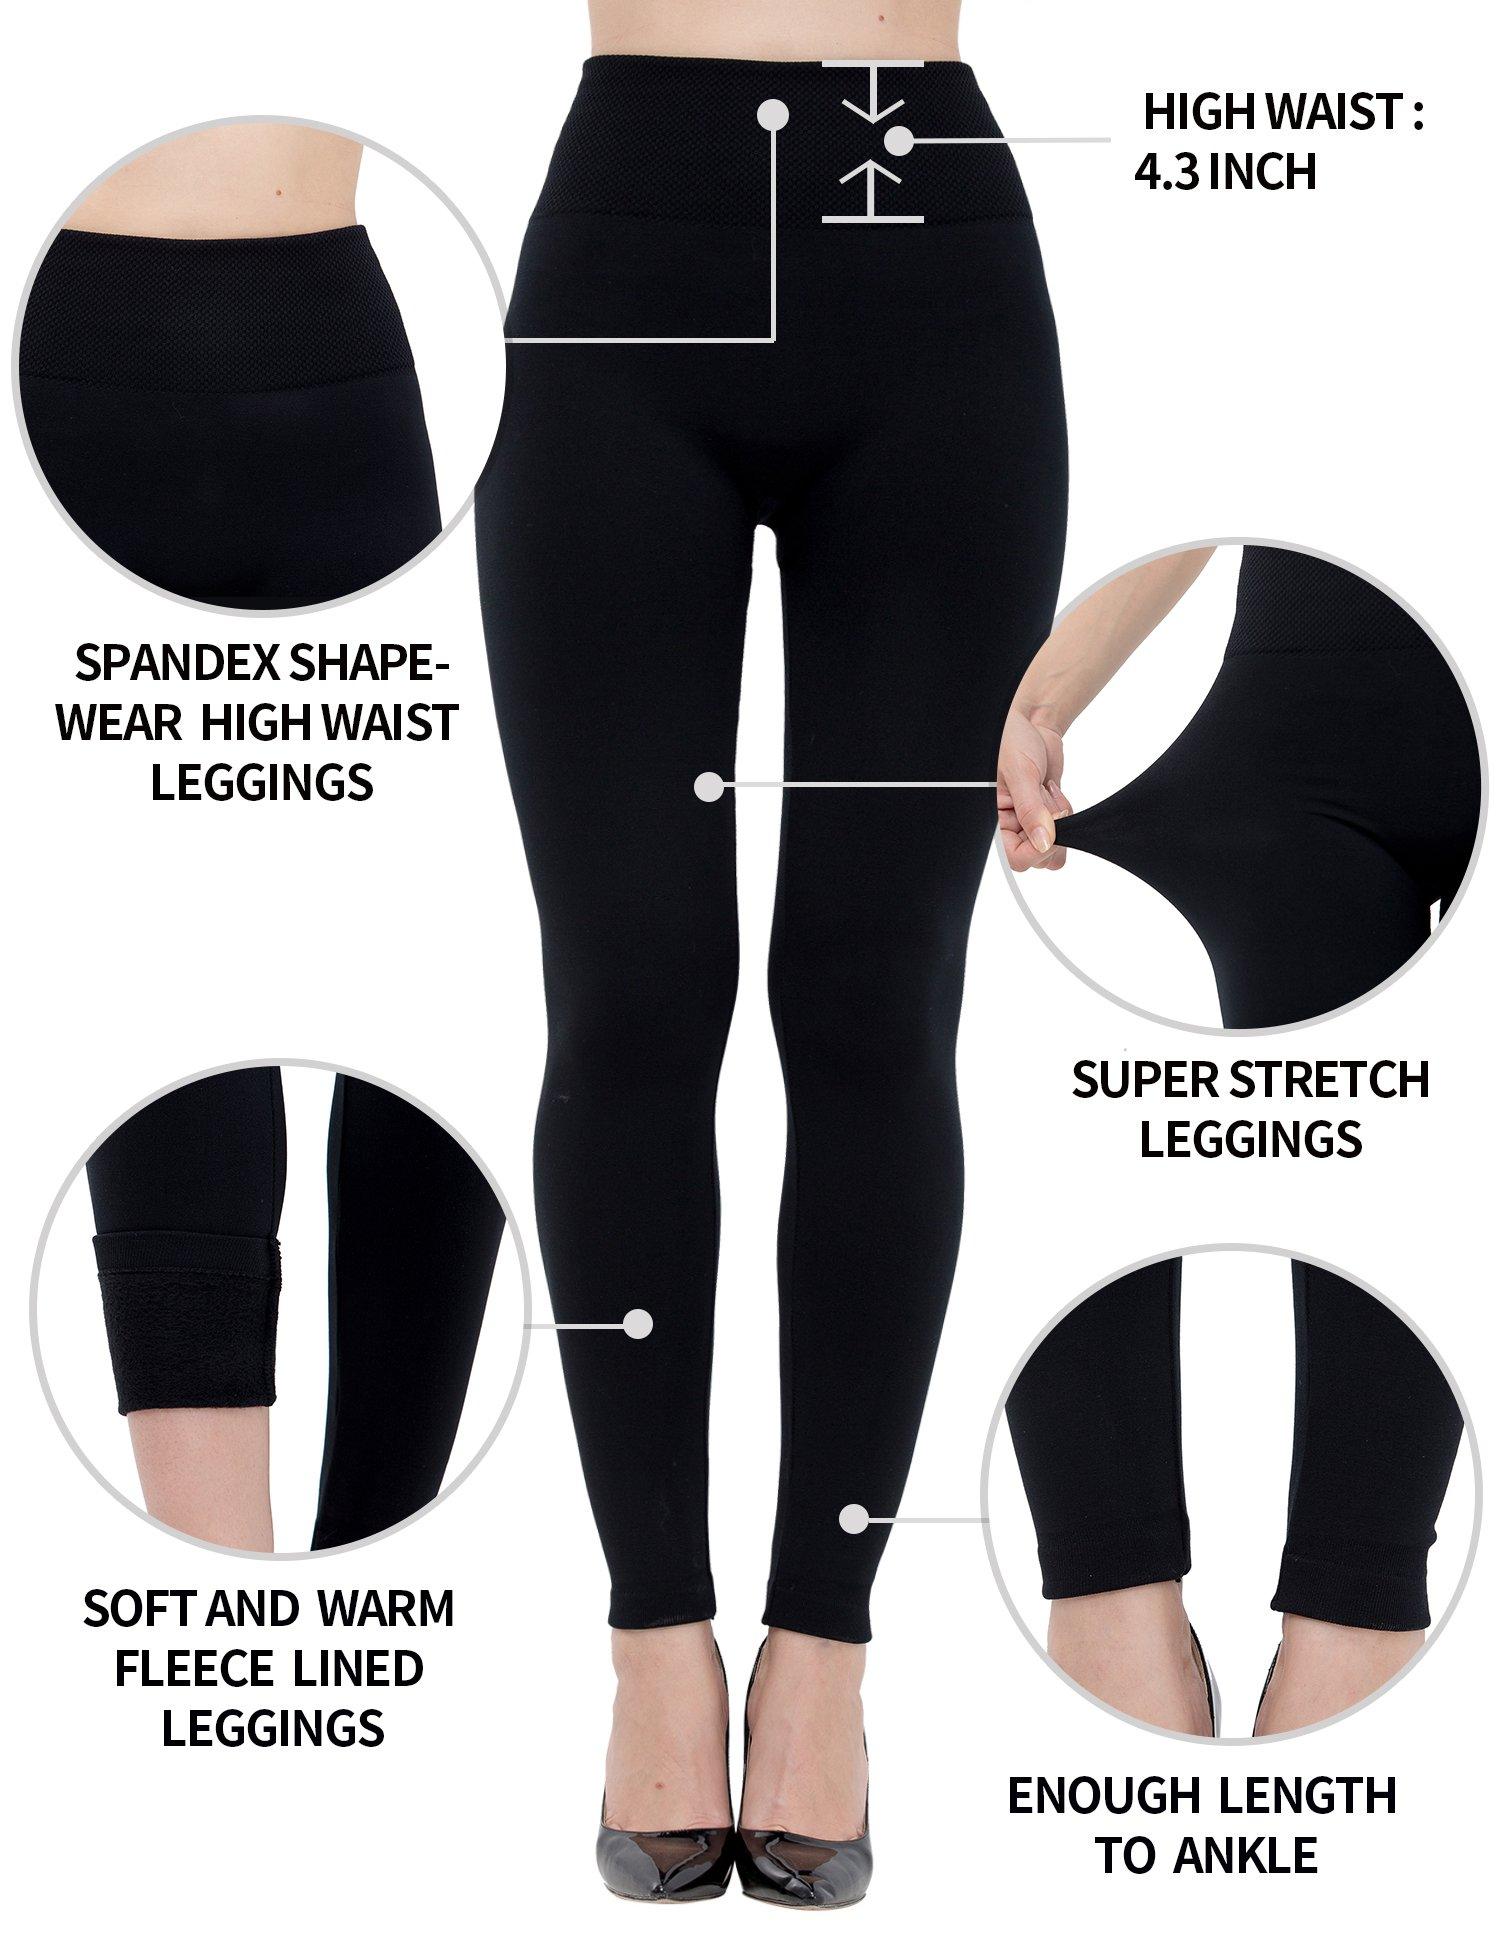 e10876766a05d Dimore 6 Pack Women High Waist Leggings - TiendaMIA.com